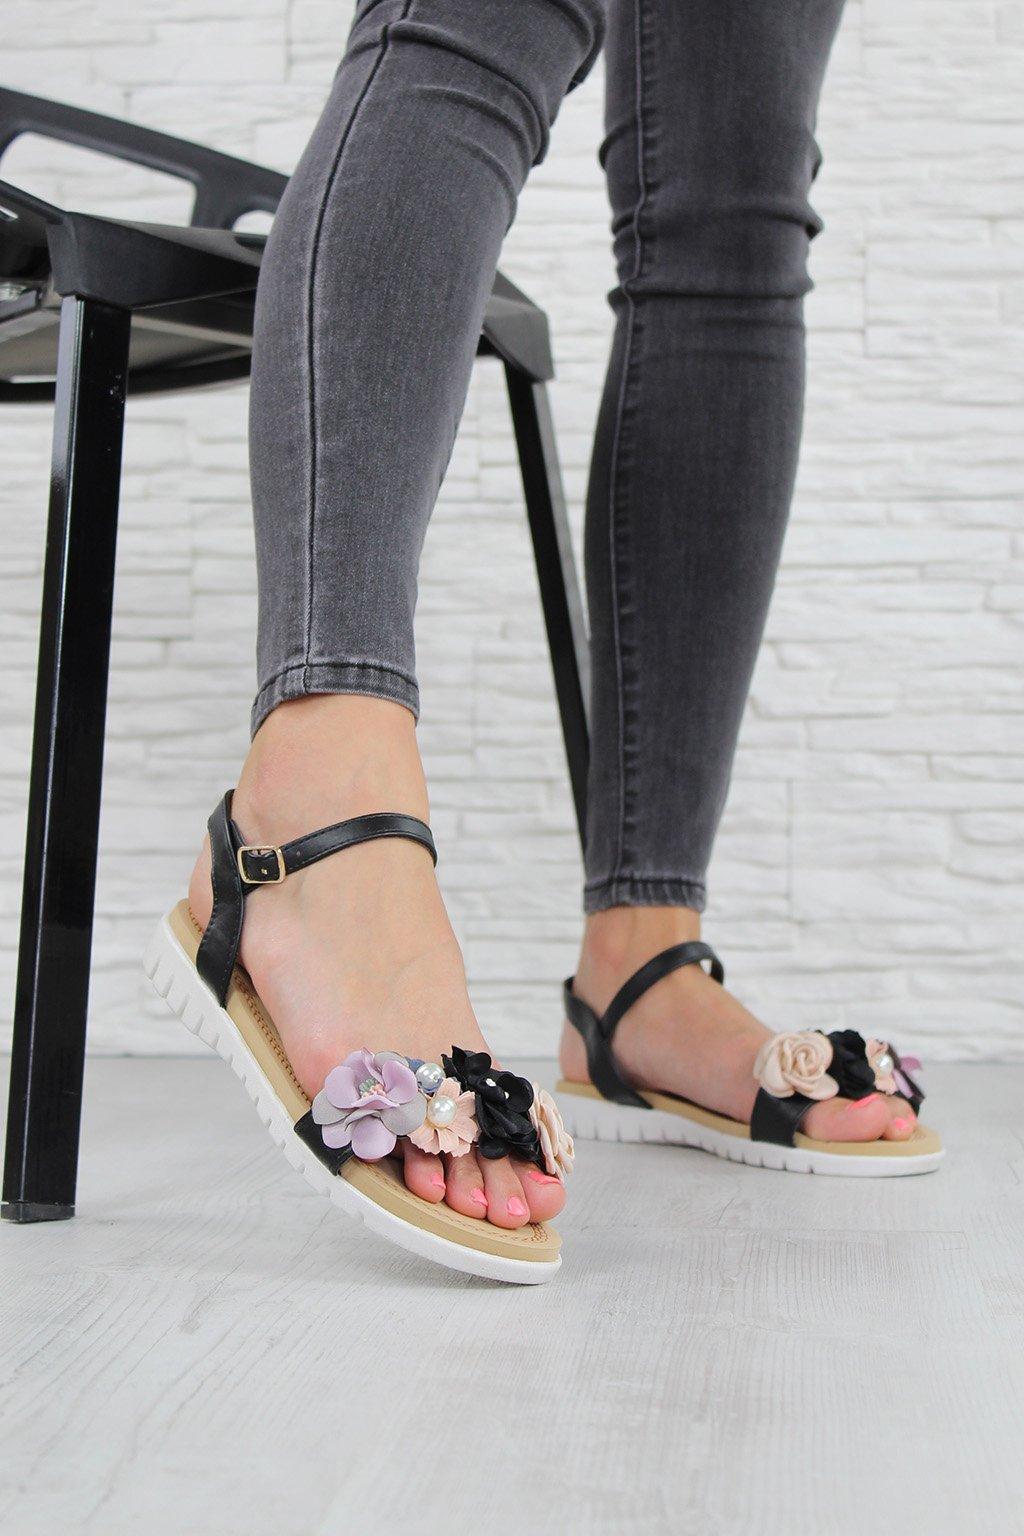 LW 7B Zdobené sandály (1)